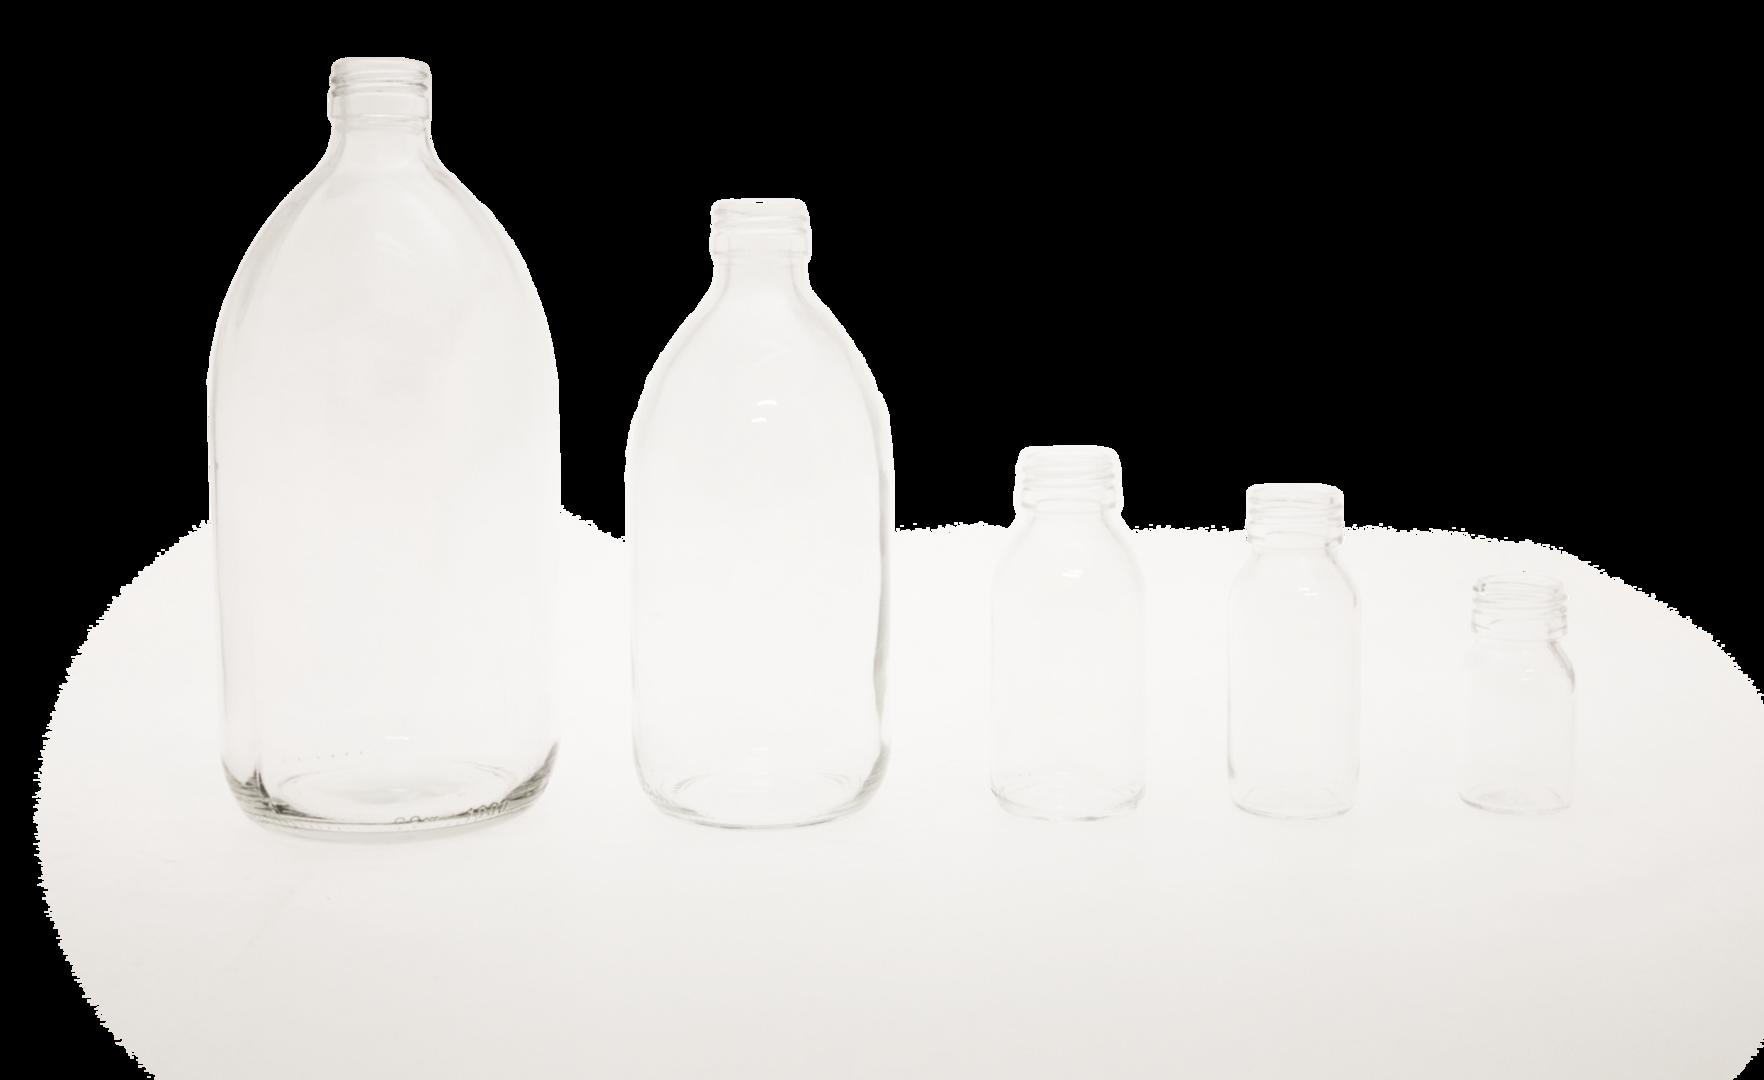 Botella de vidrio transparente con tapa de rosca pp28 venta - Vidrio plastico transparente precio ...